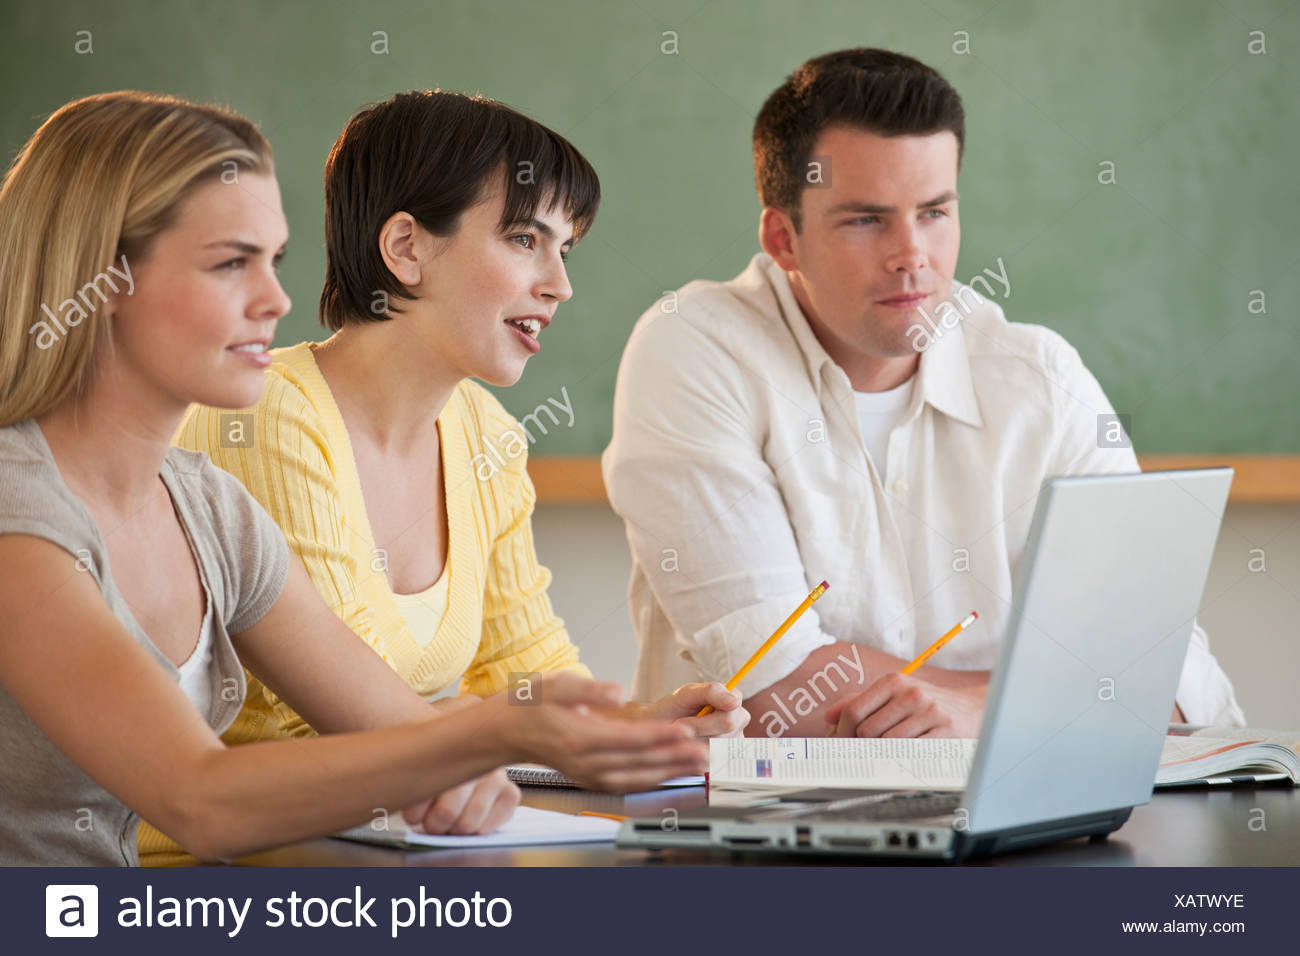 Laptops in classroom